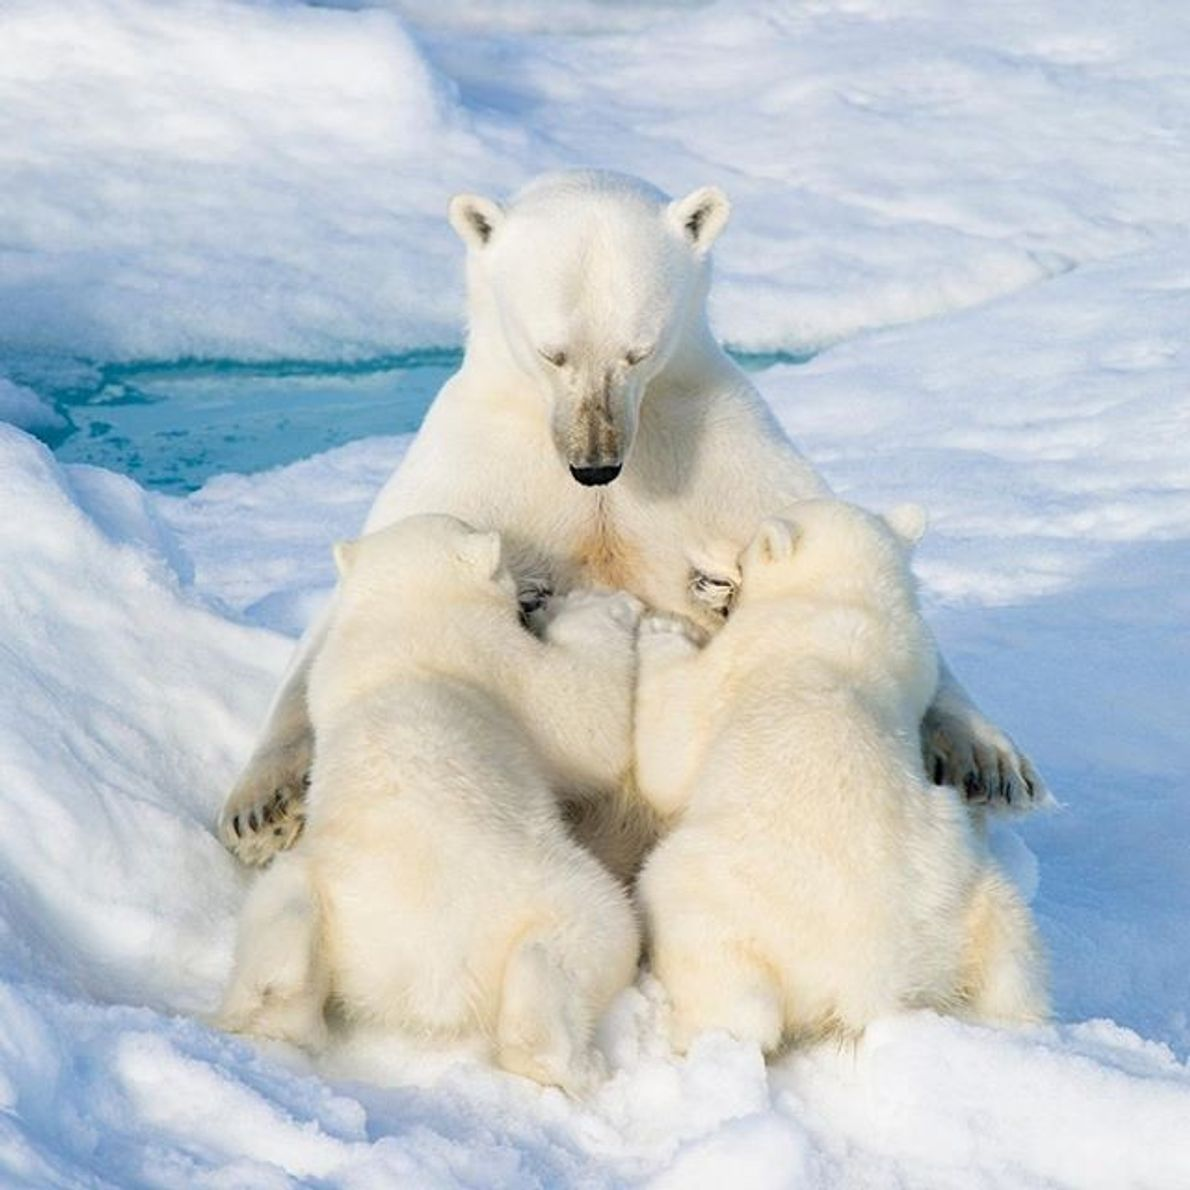 Una osa polar